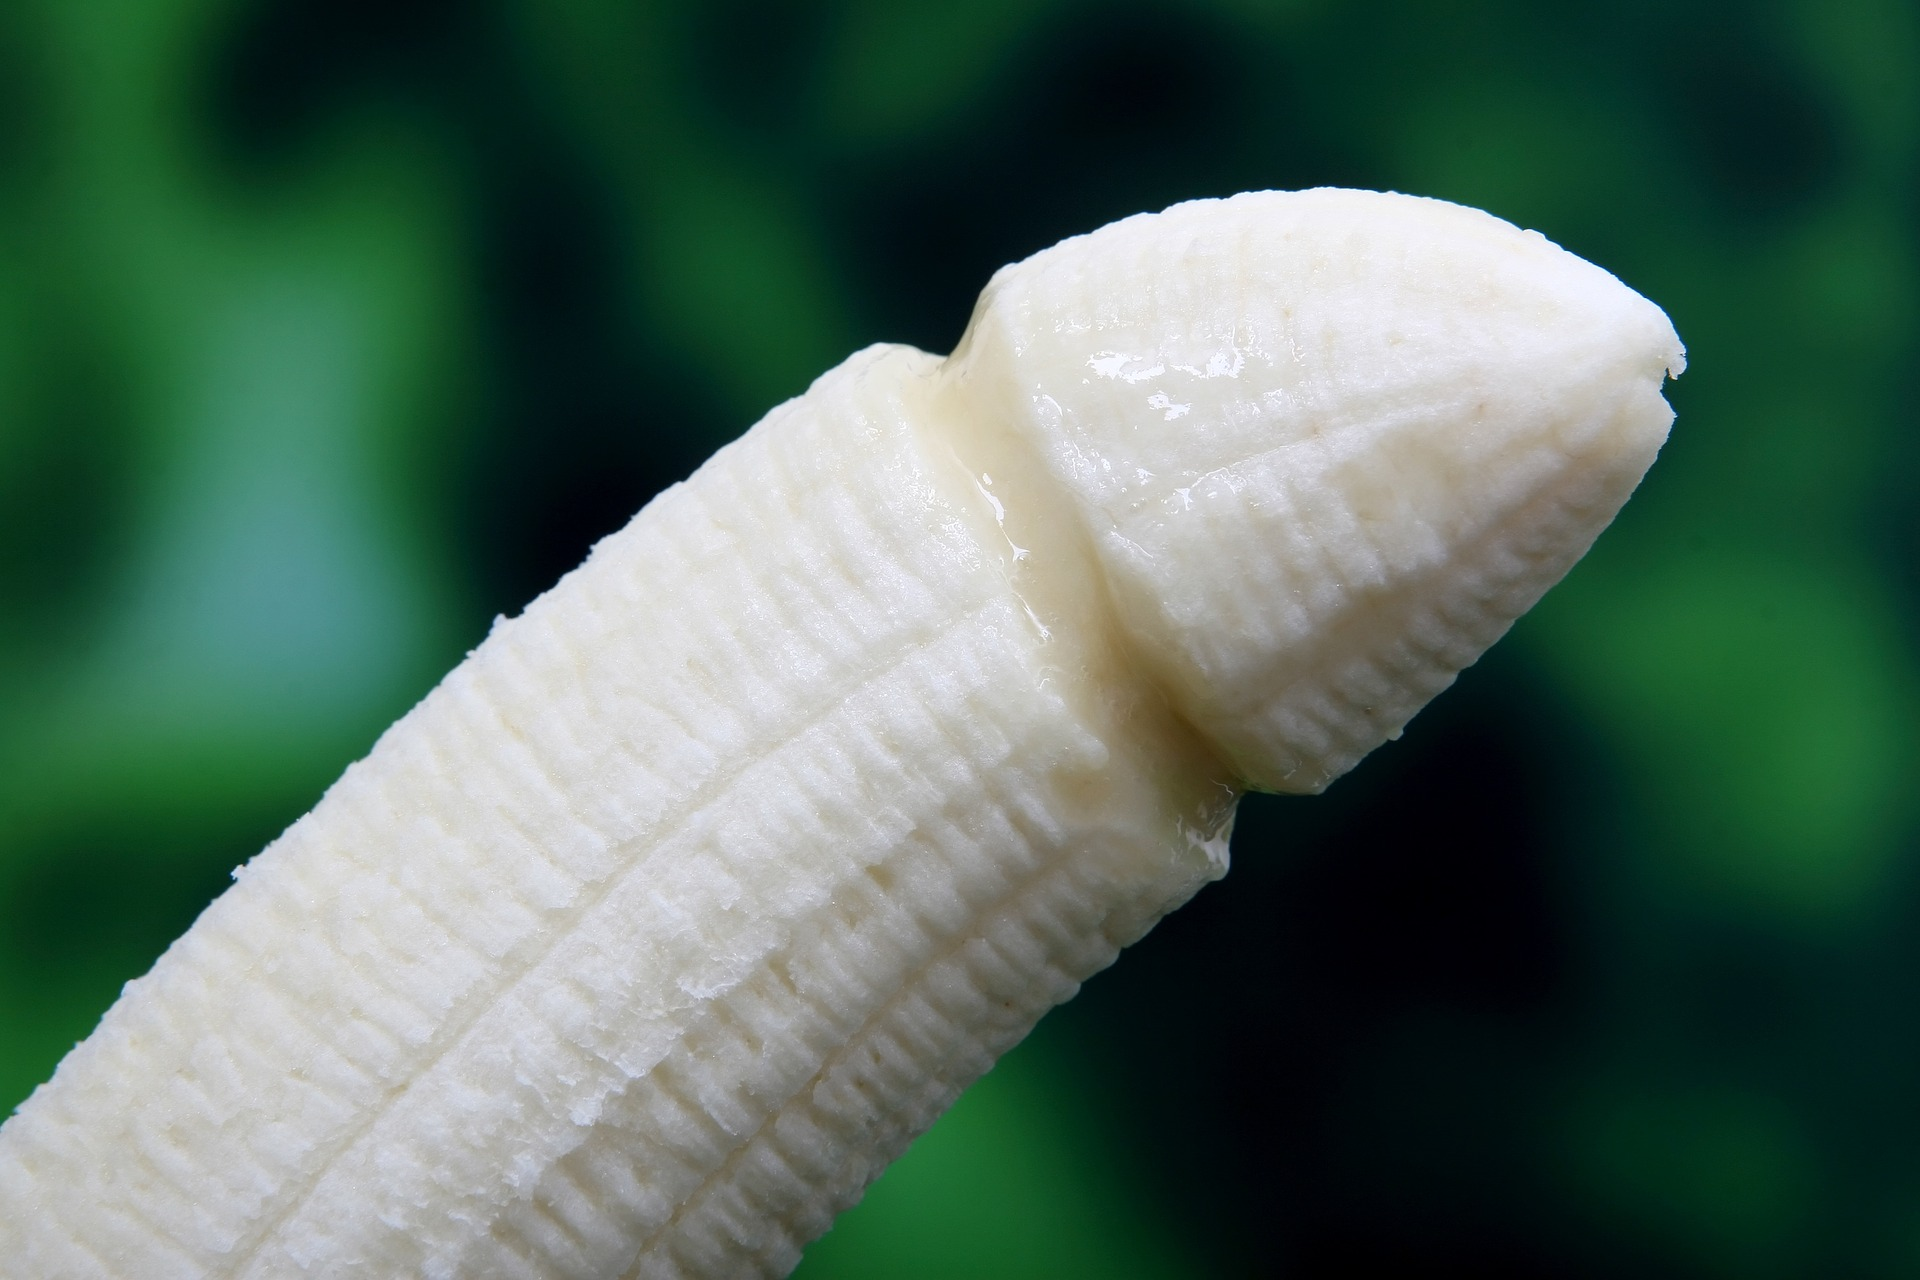 Kann man den Penis abbeißen?